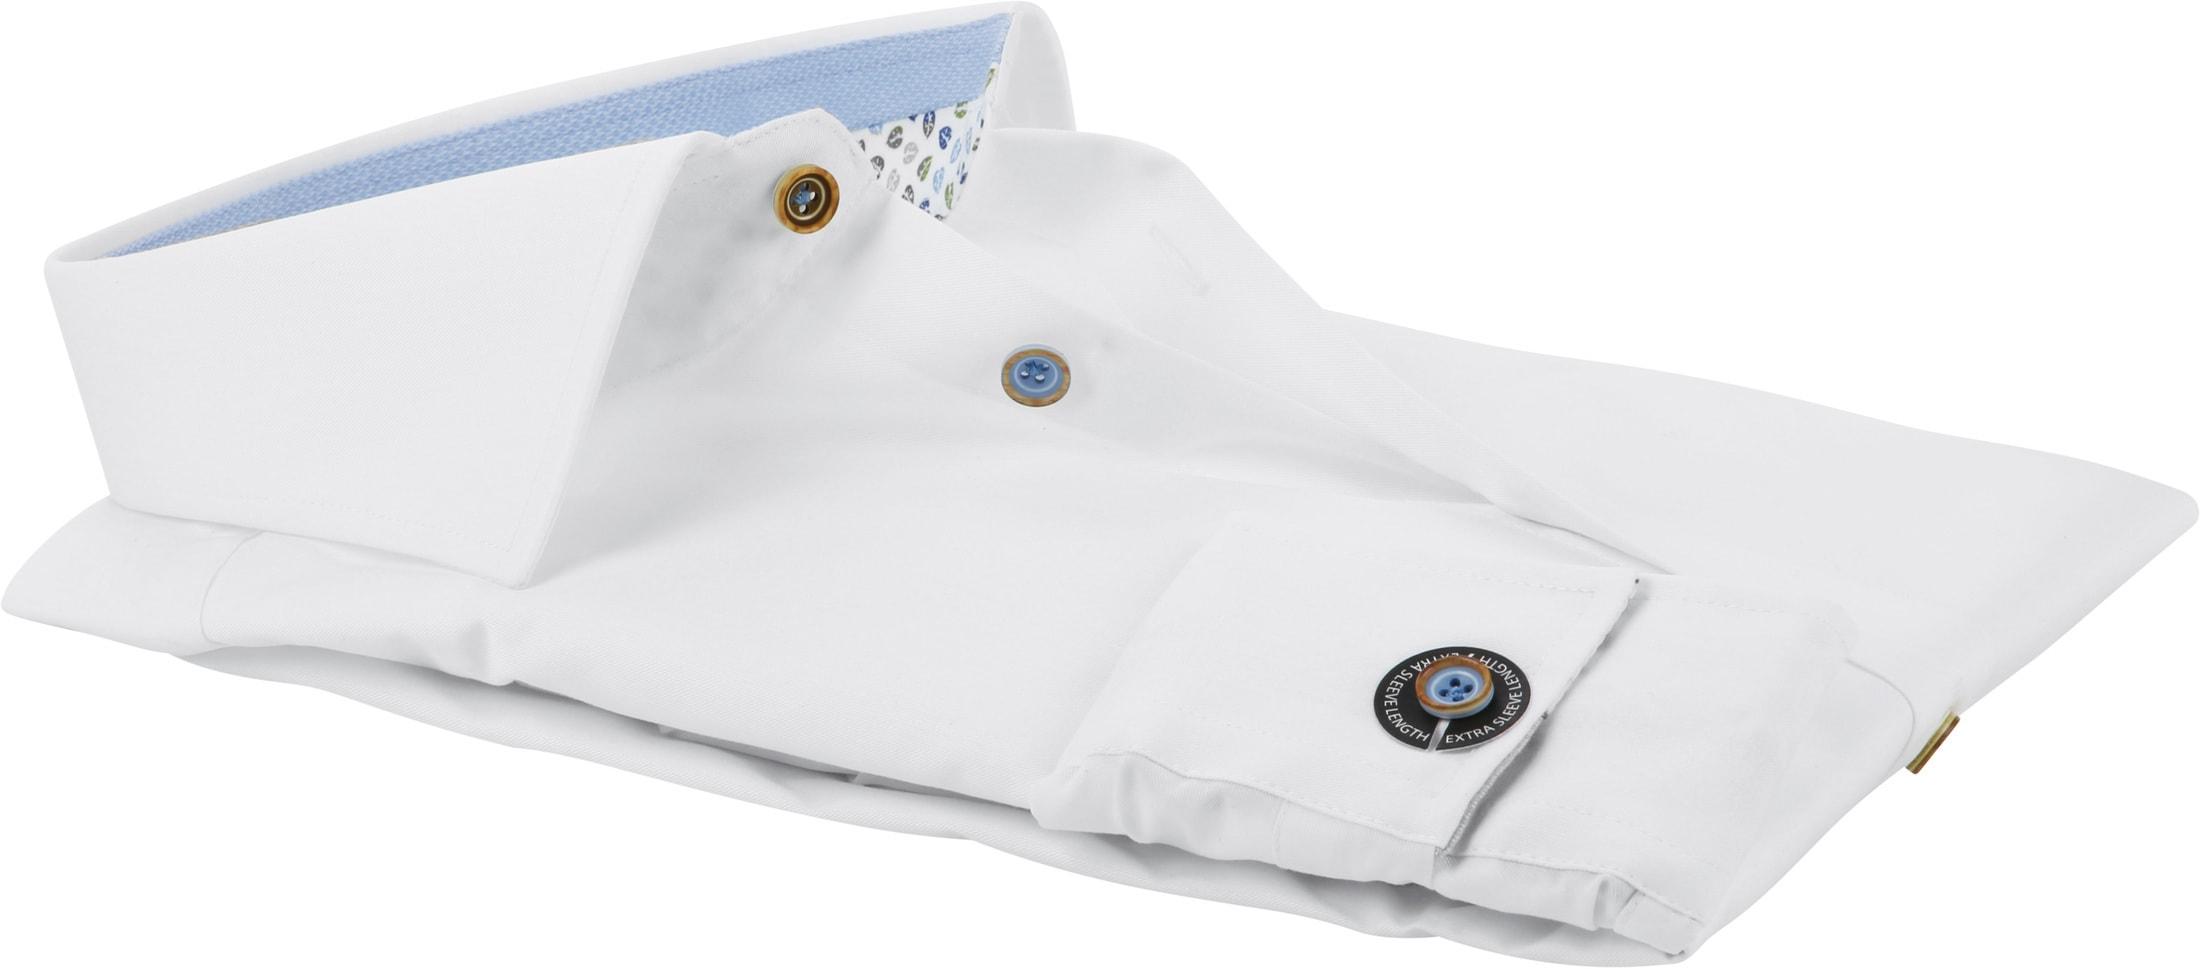 Ledub Shirt Button White SL7 foto 2